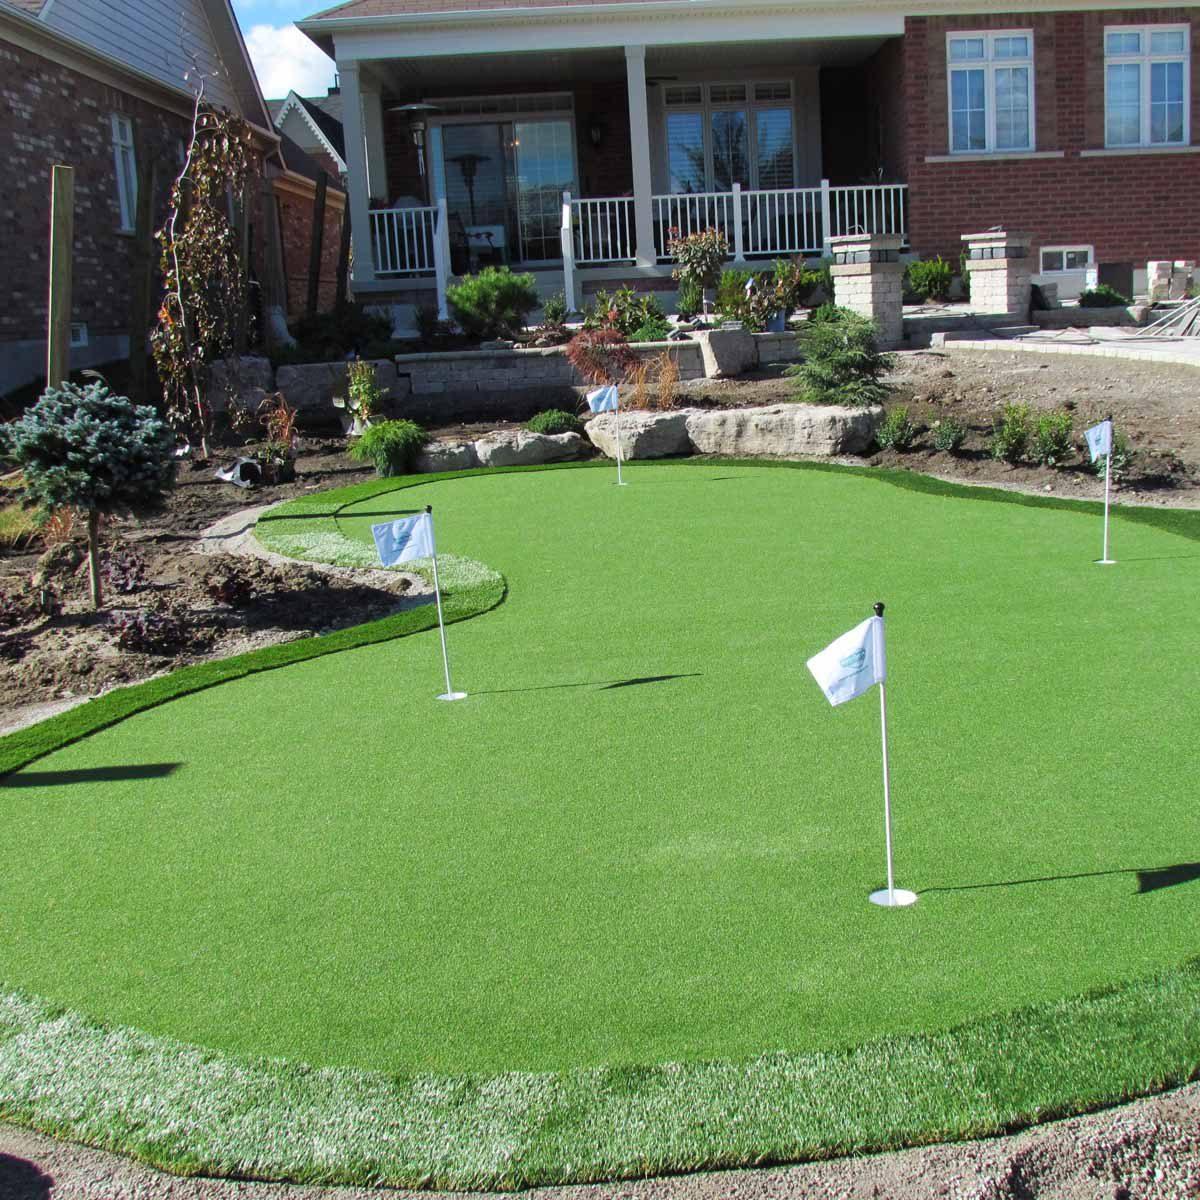 19 Crazy Cool Backyard Putting Greens — The Family Handyman on Putting Green Ideas For Backyard id=99181